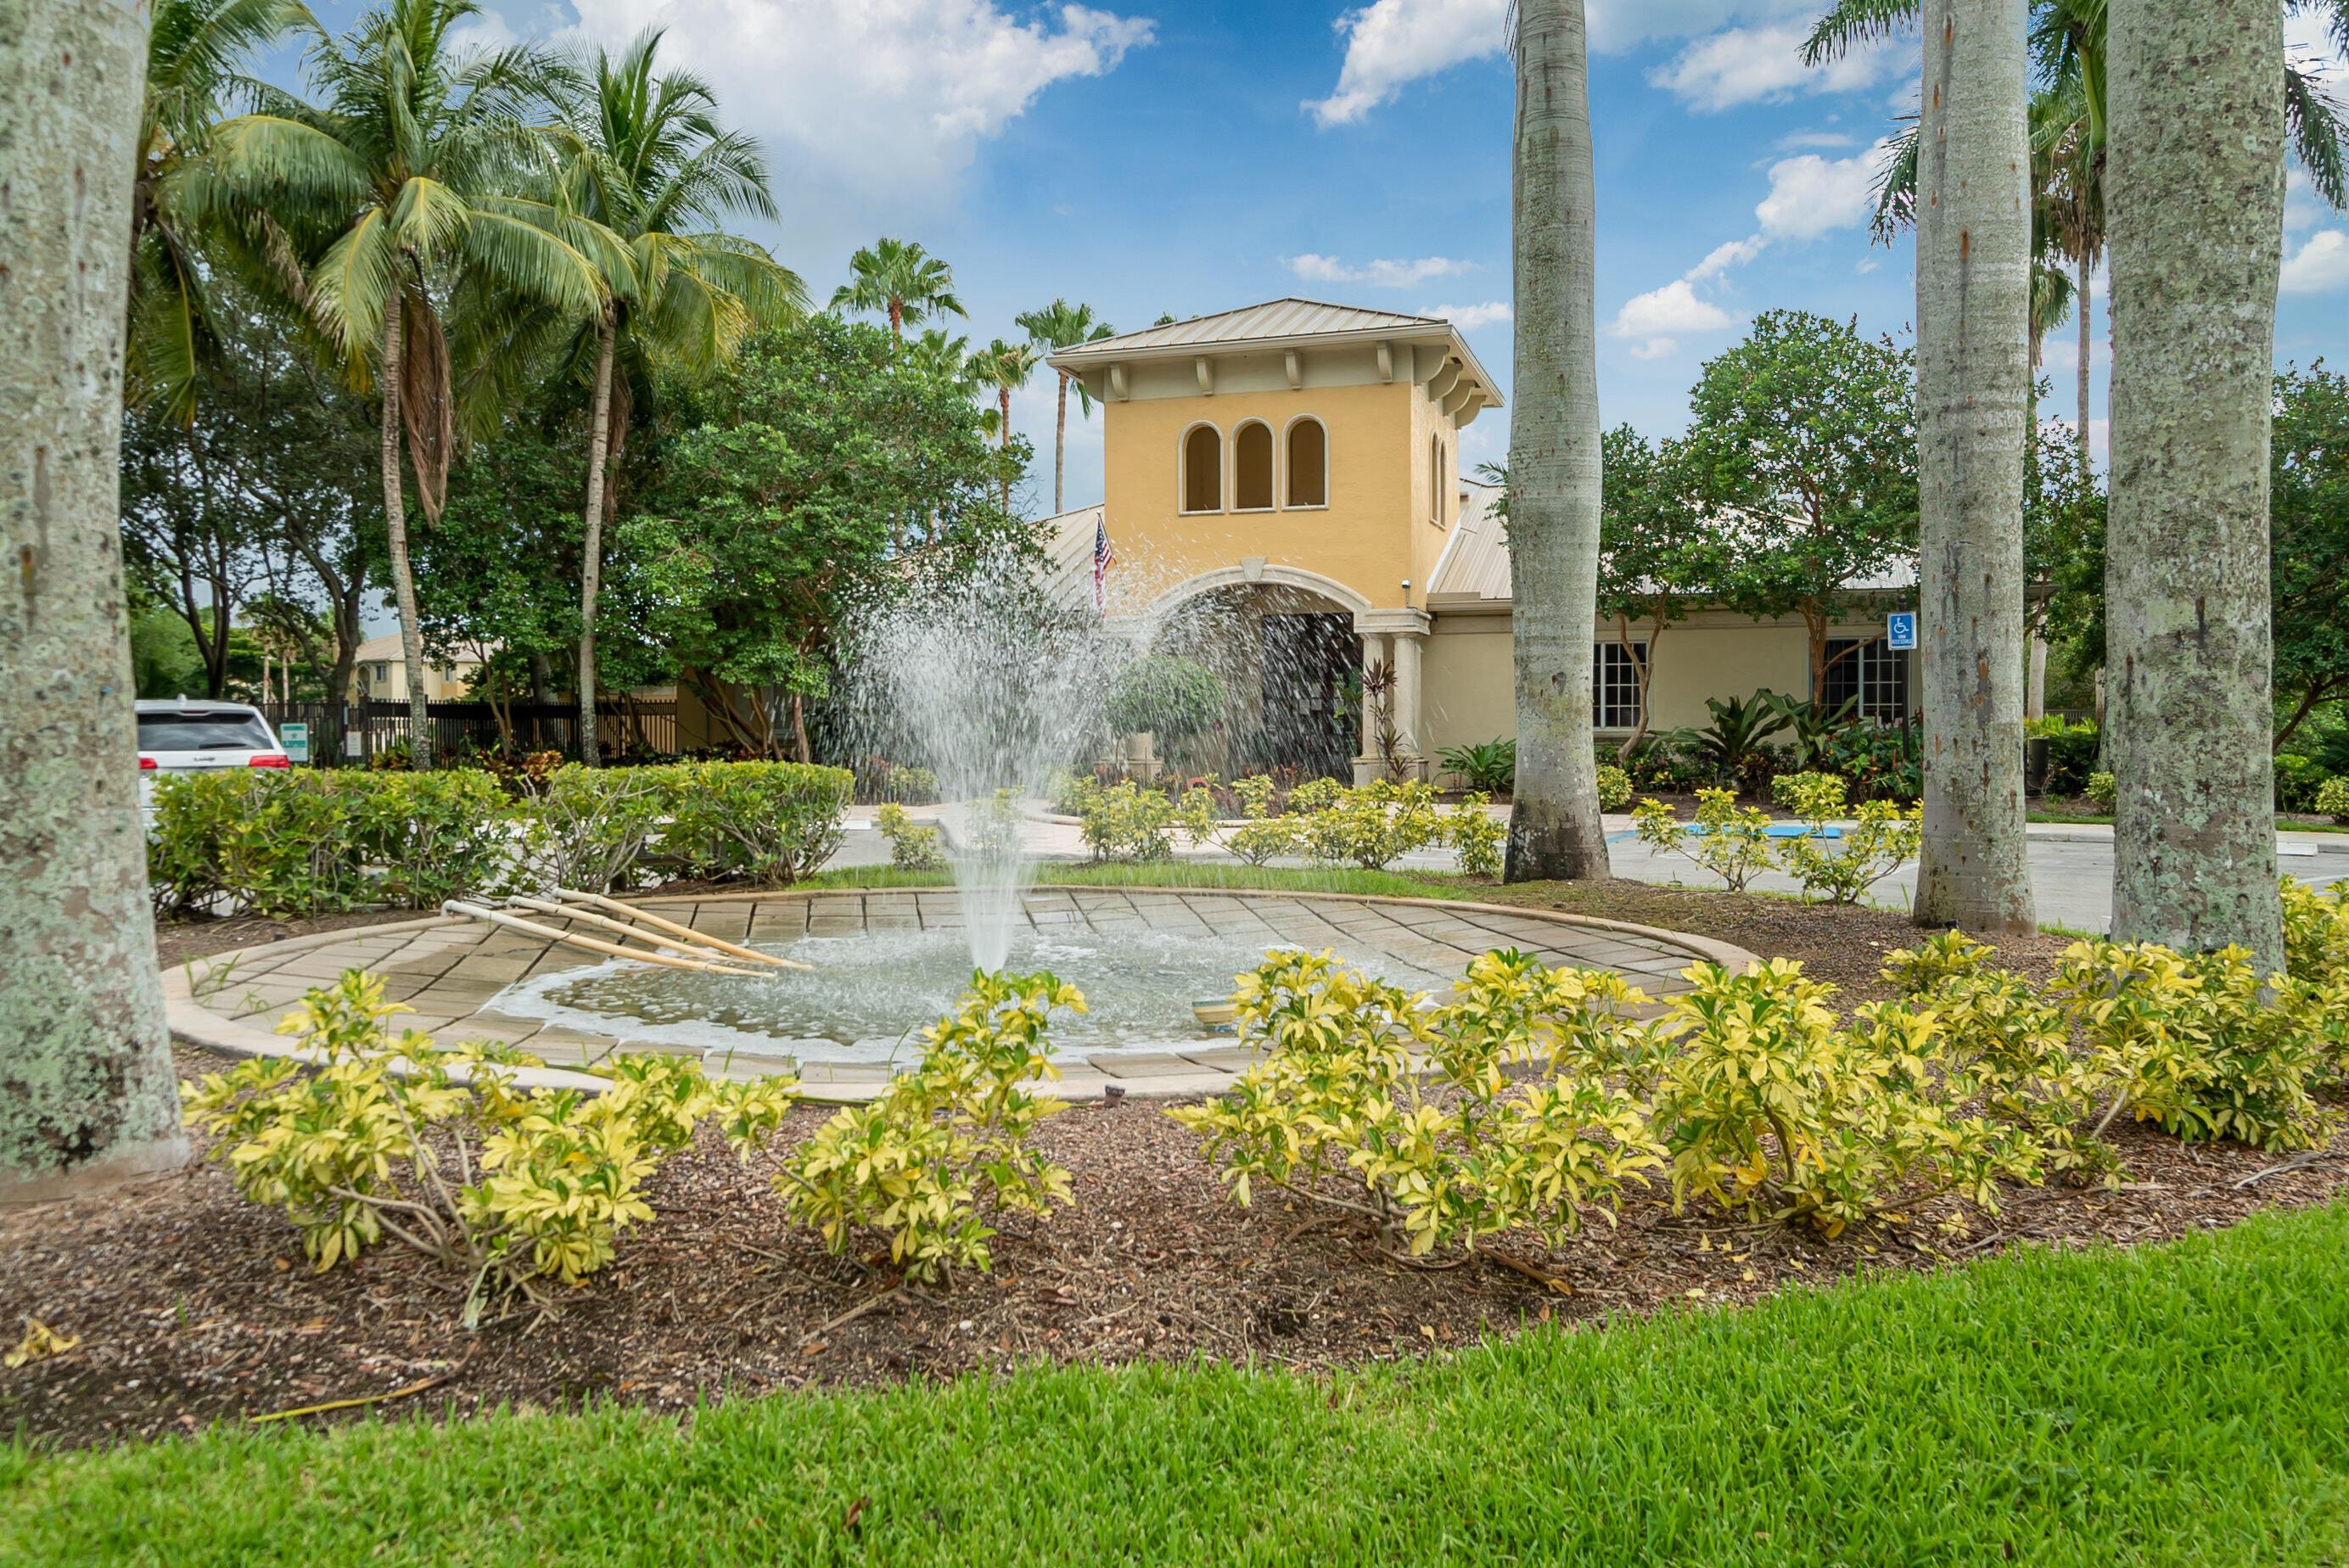 200 Crest Wood N Court, West Palm Beach, FL 33411